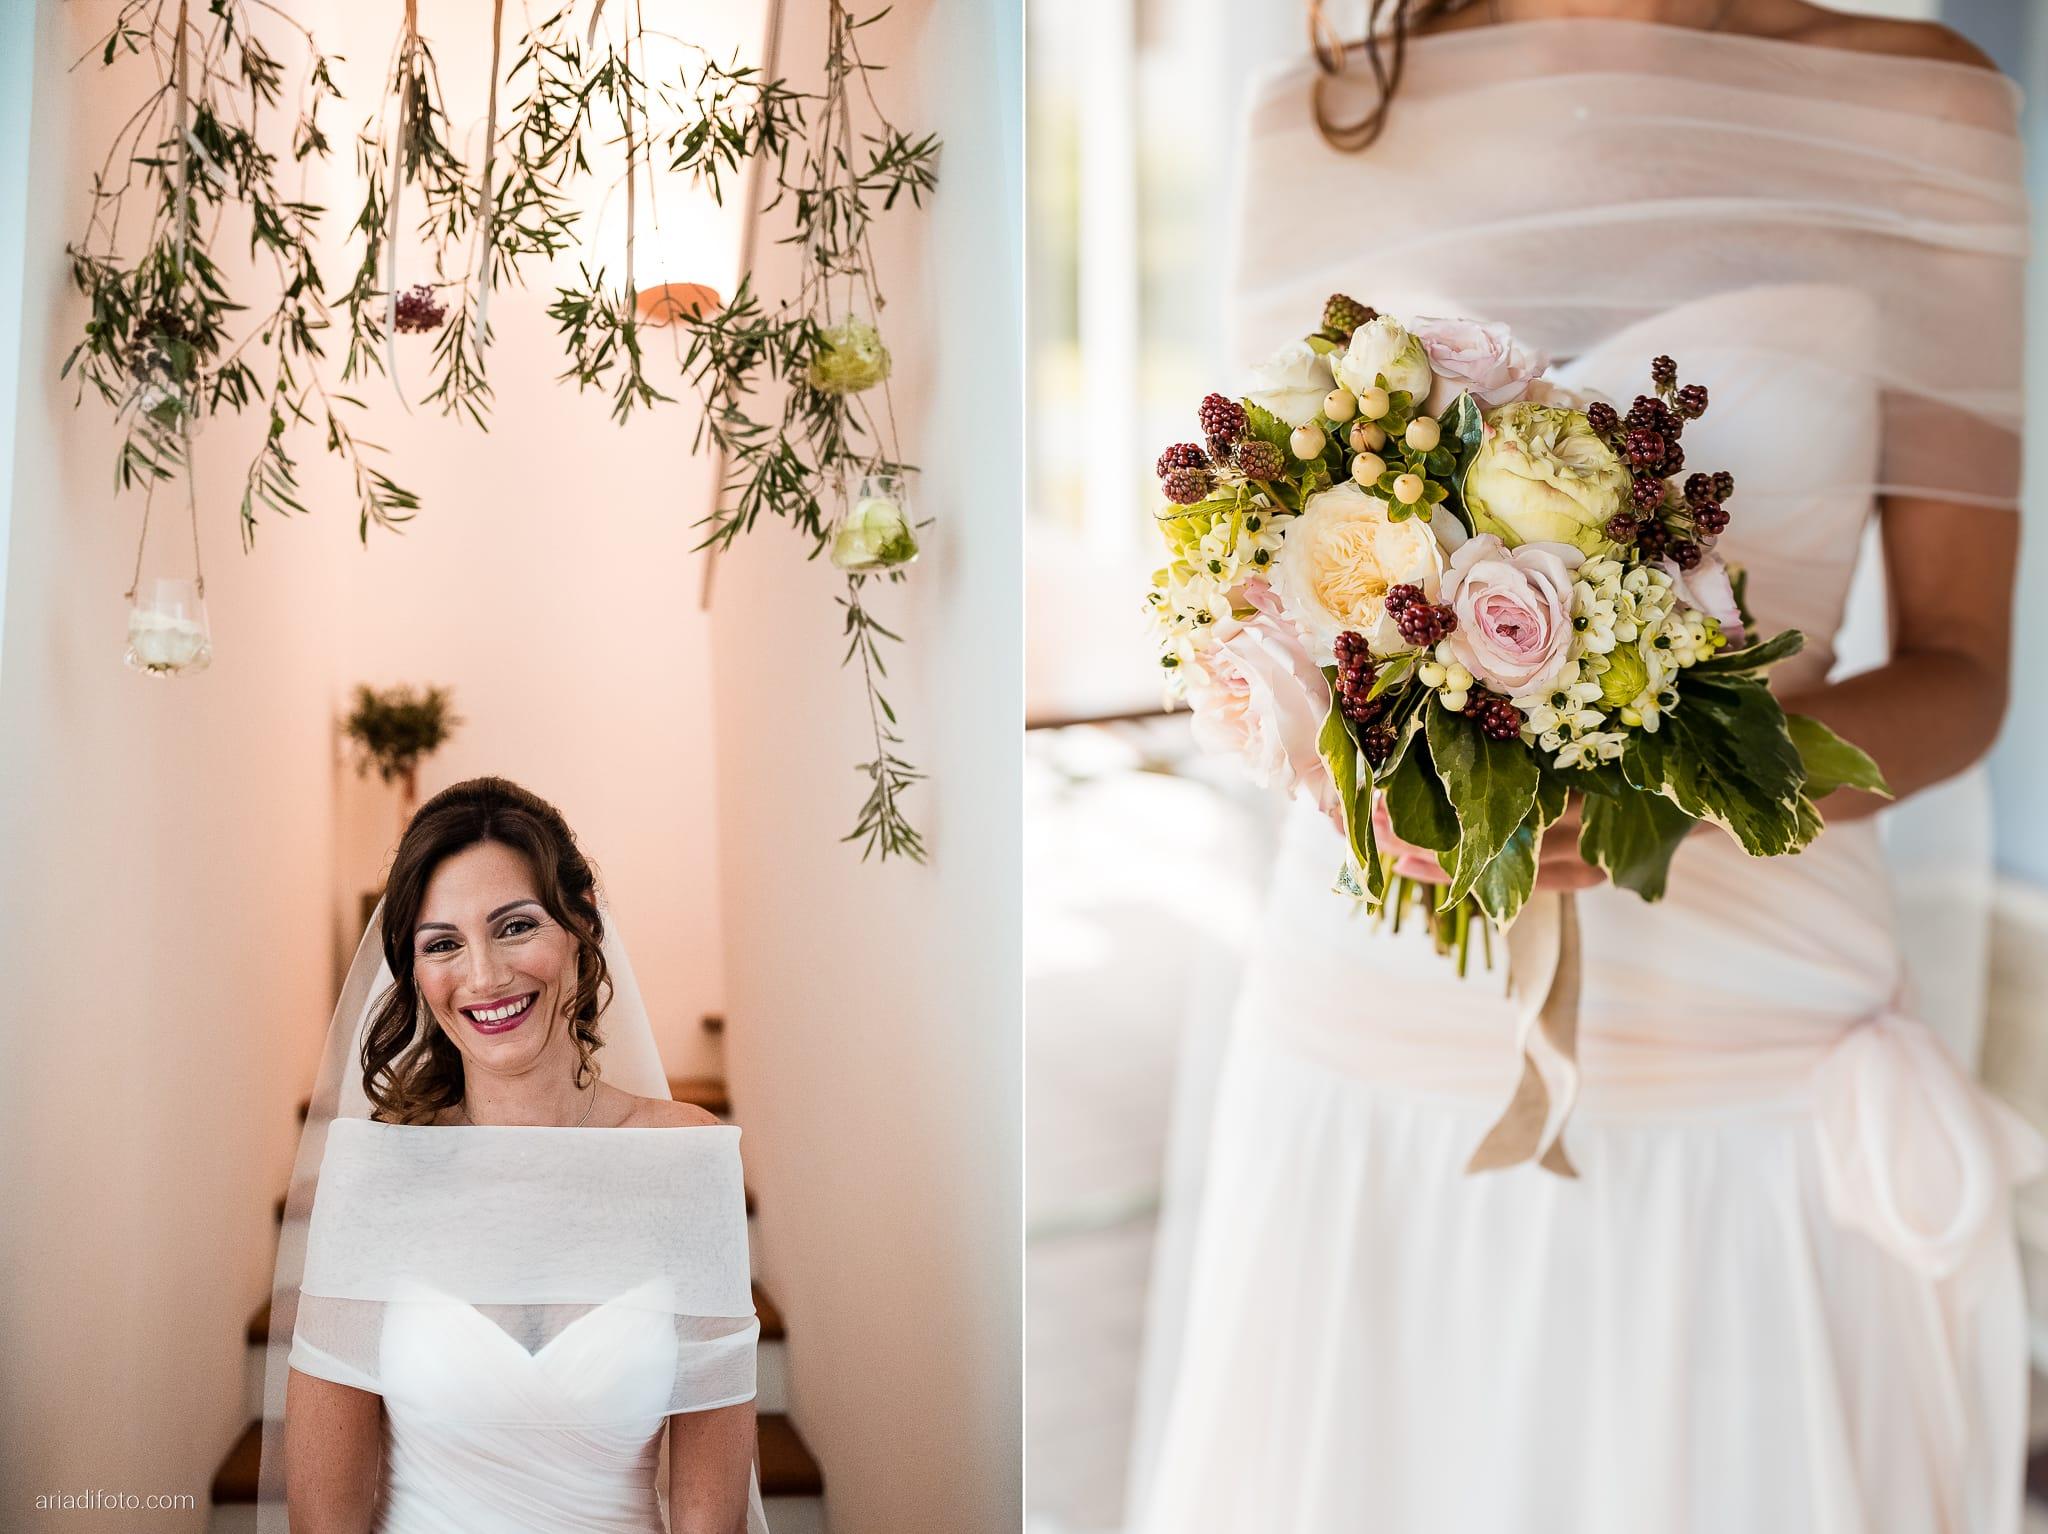 Stefania Raffaele Matrimonio Country Chic Outdoor Gorizia dettagli bouquet